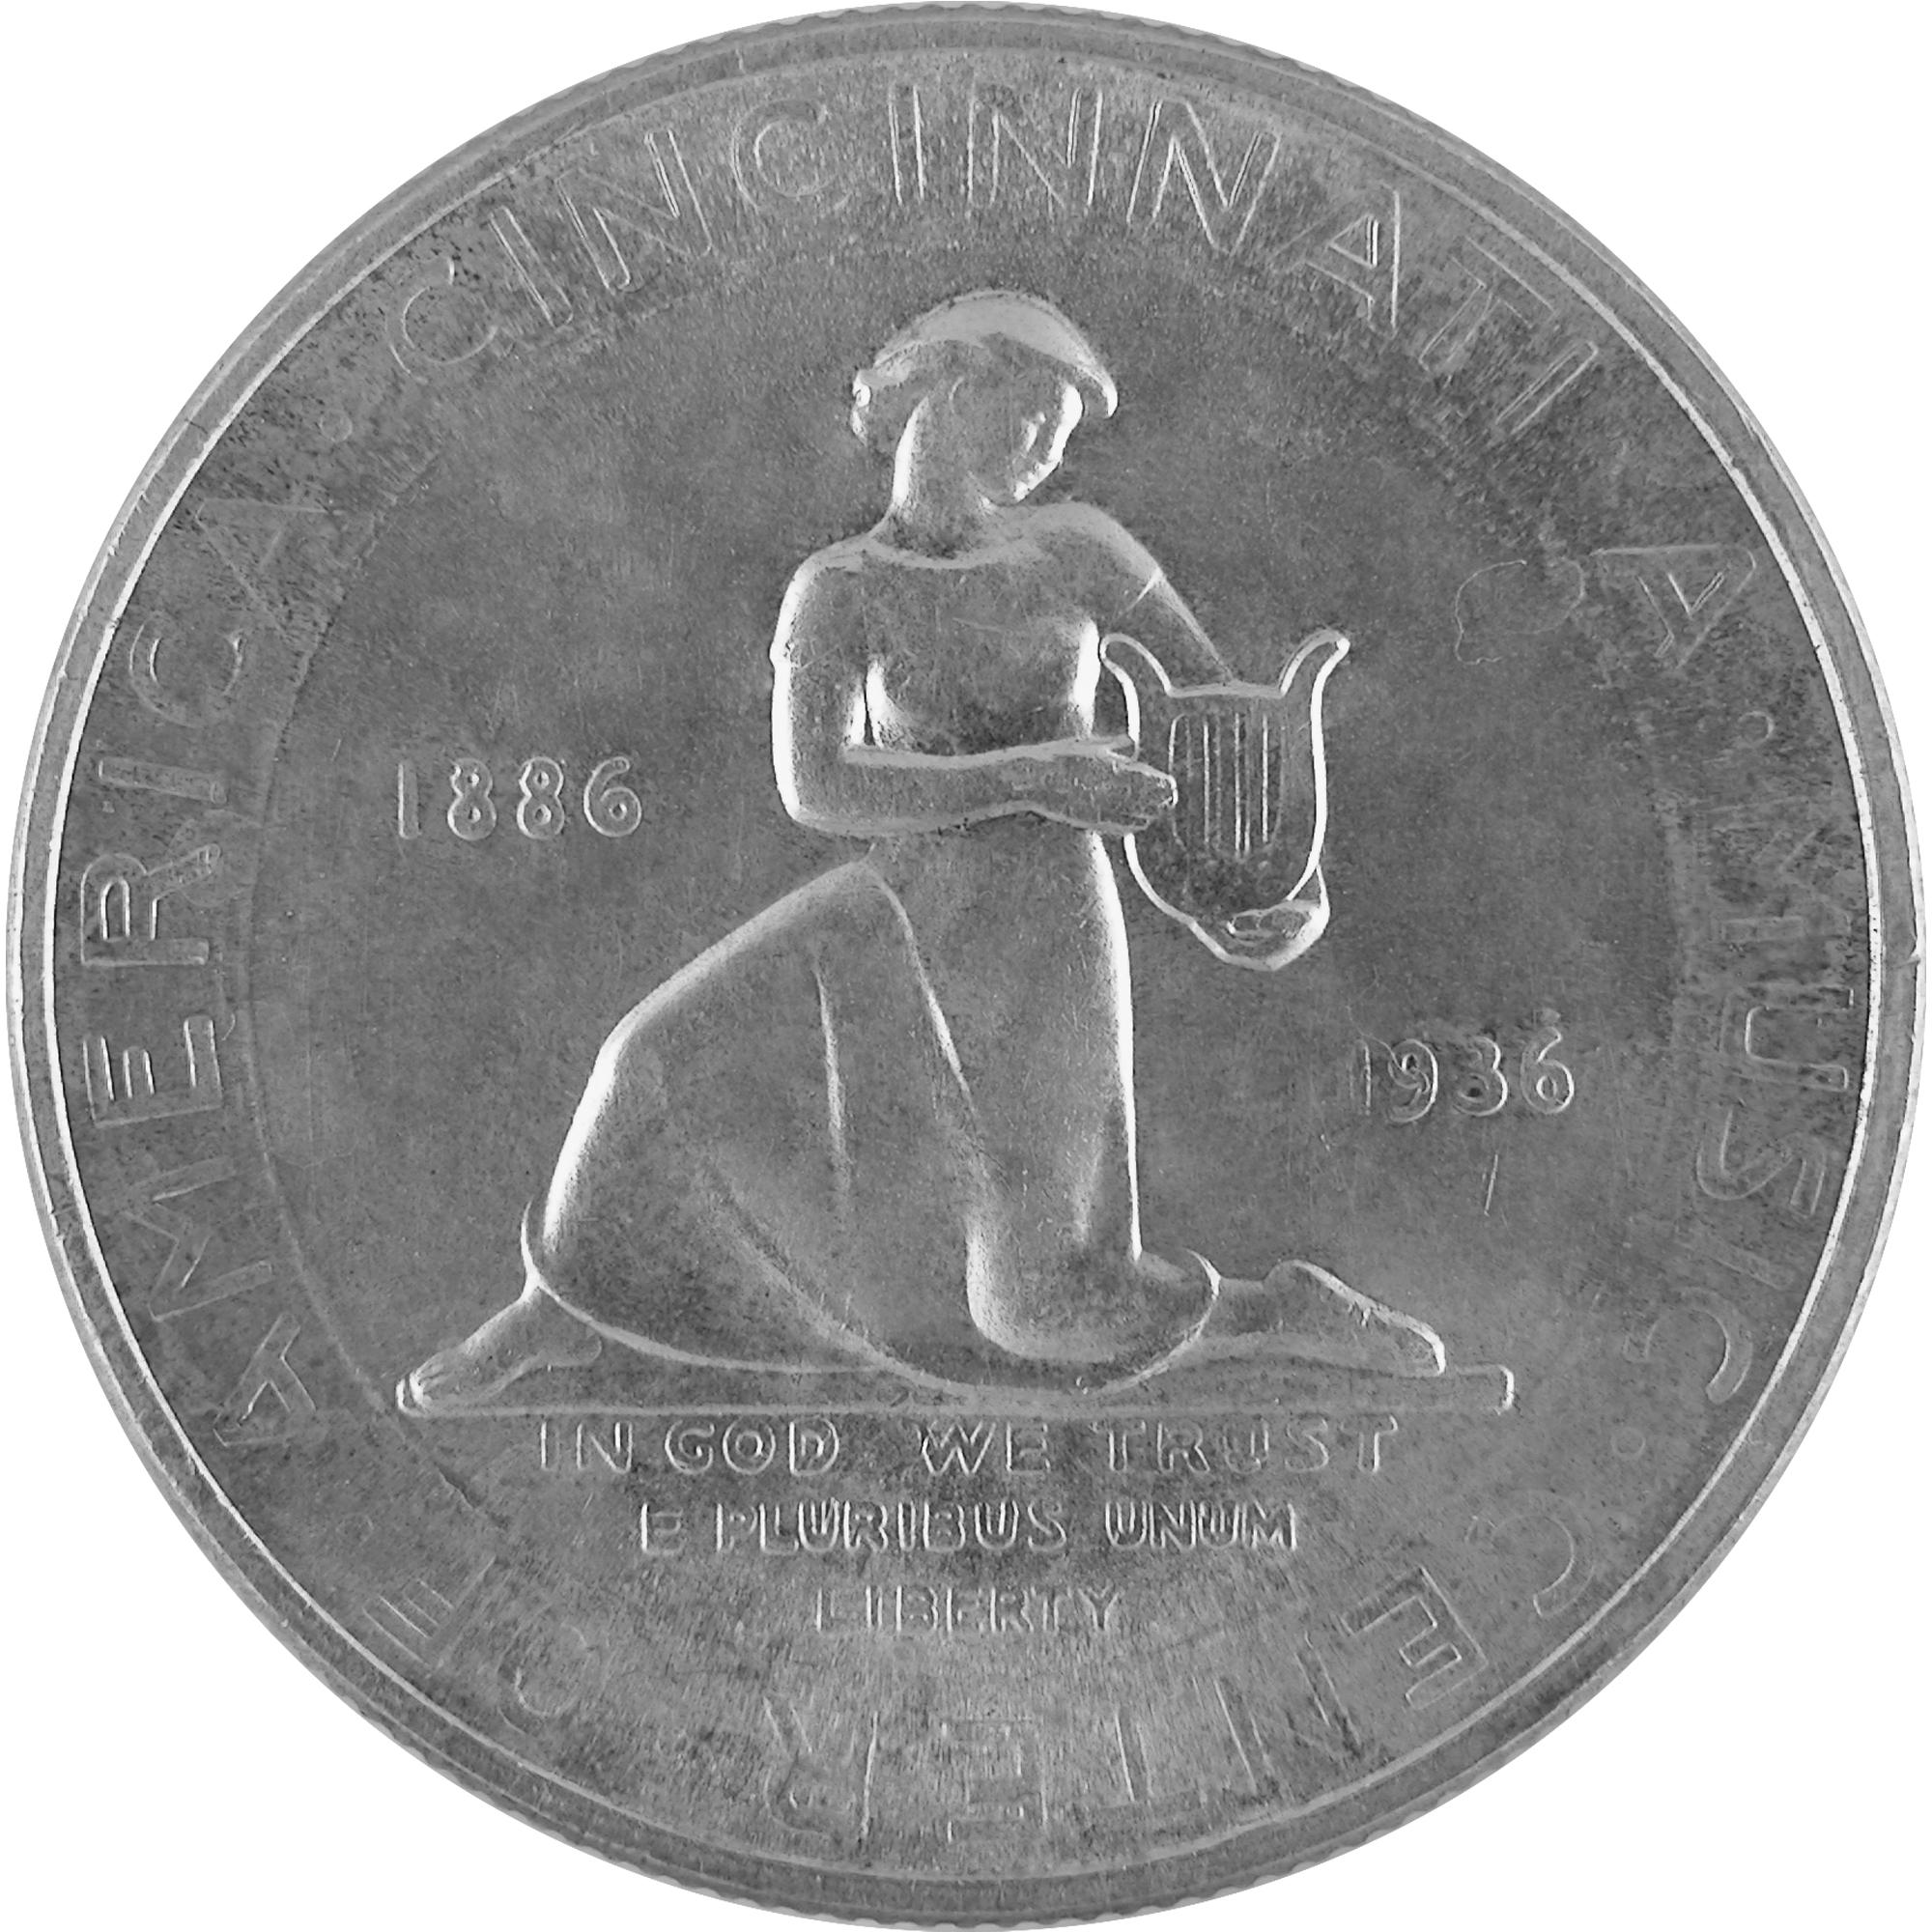 1936 Cincinnati Music Center Fiftieth Anniversary Commemorative Silver Half Dollar Coin Reverse